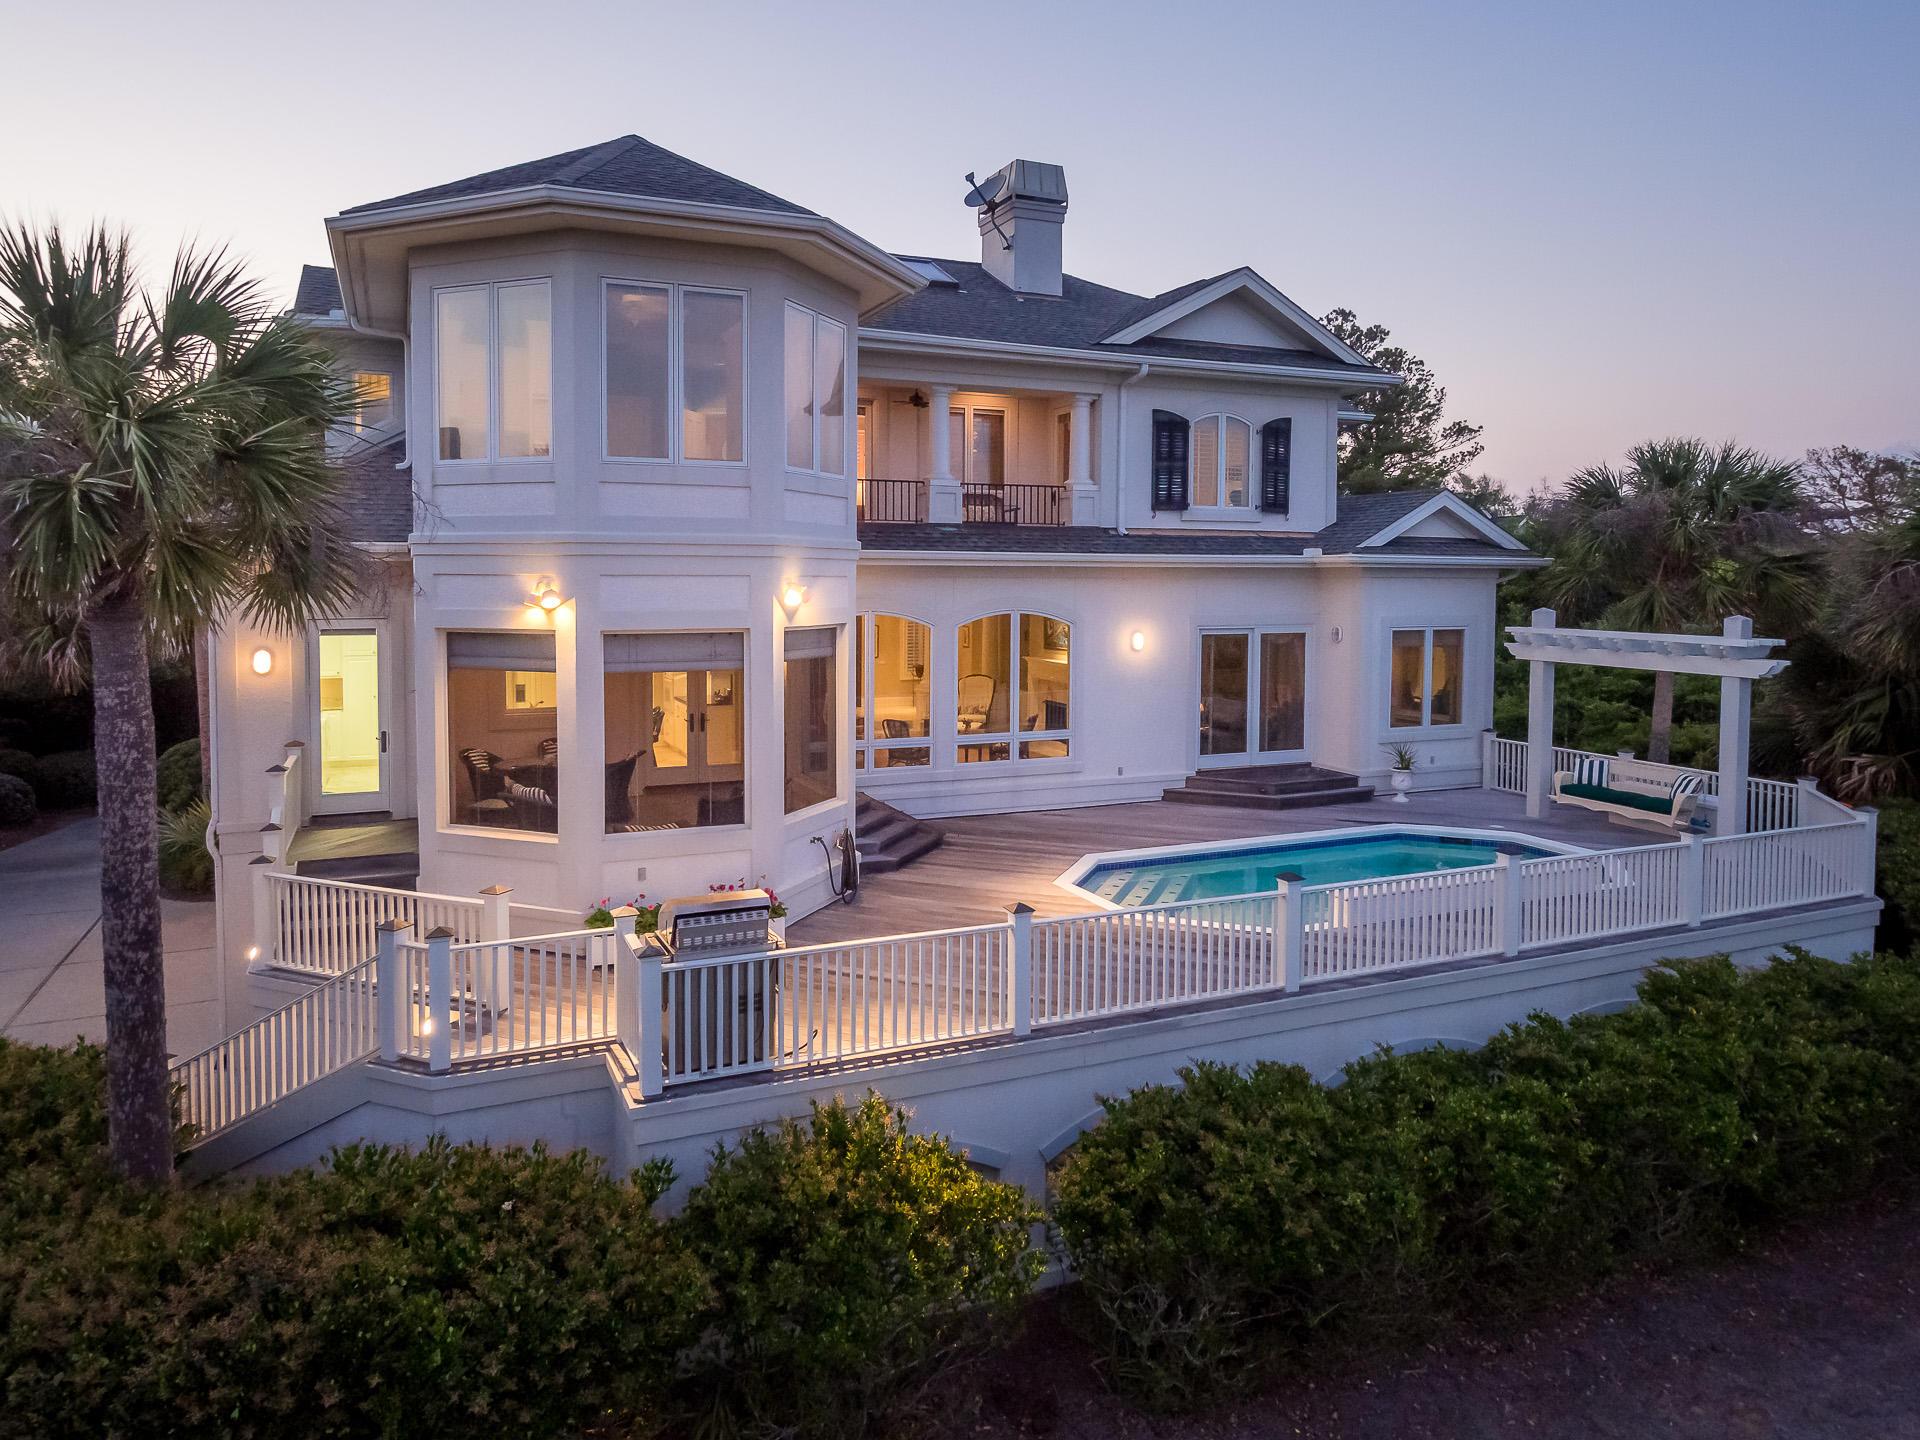 Seabrook Island Homes For Sale - 2216 Rolling Dune, Seabrook Island, SC - 59